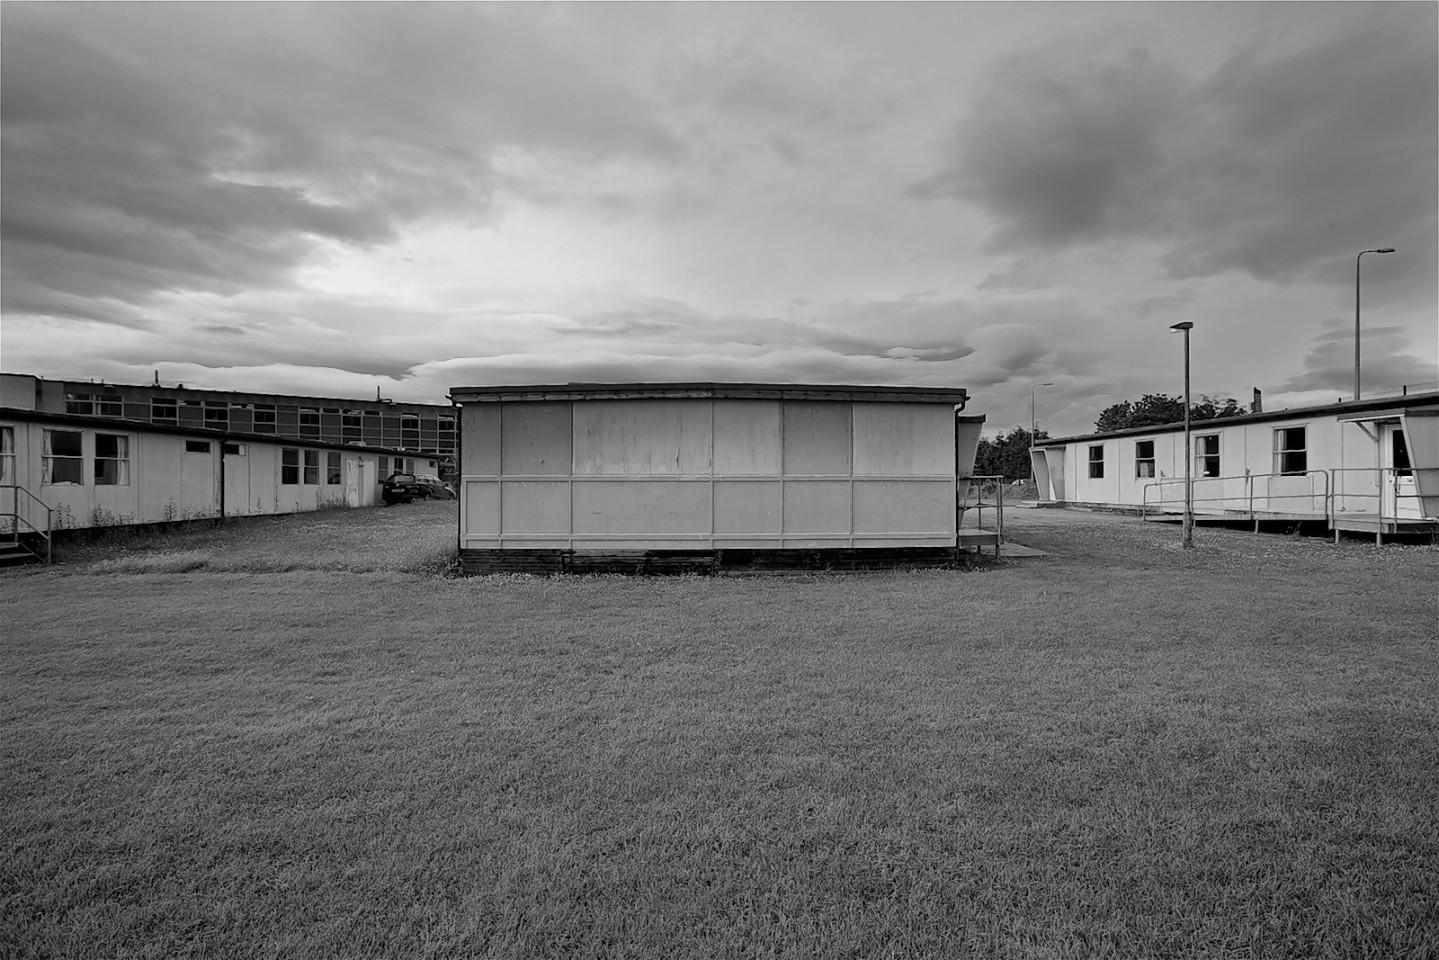 Inverness Royal Academy external classroom huts 1977-2016